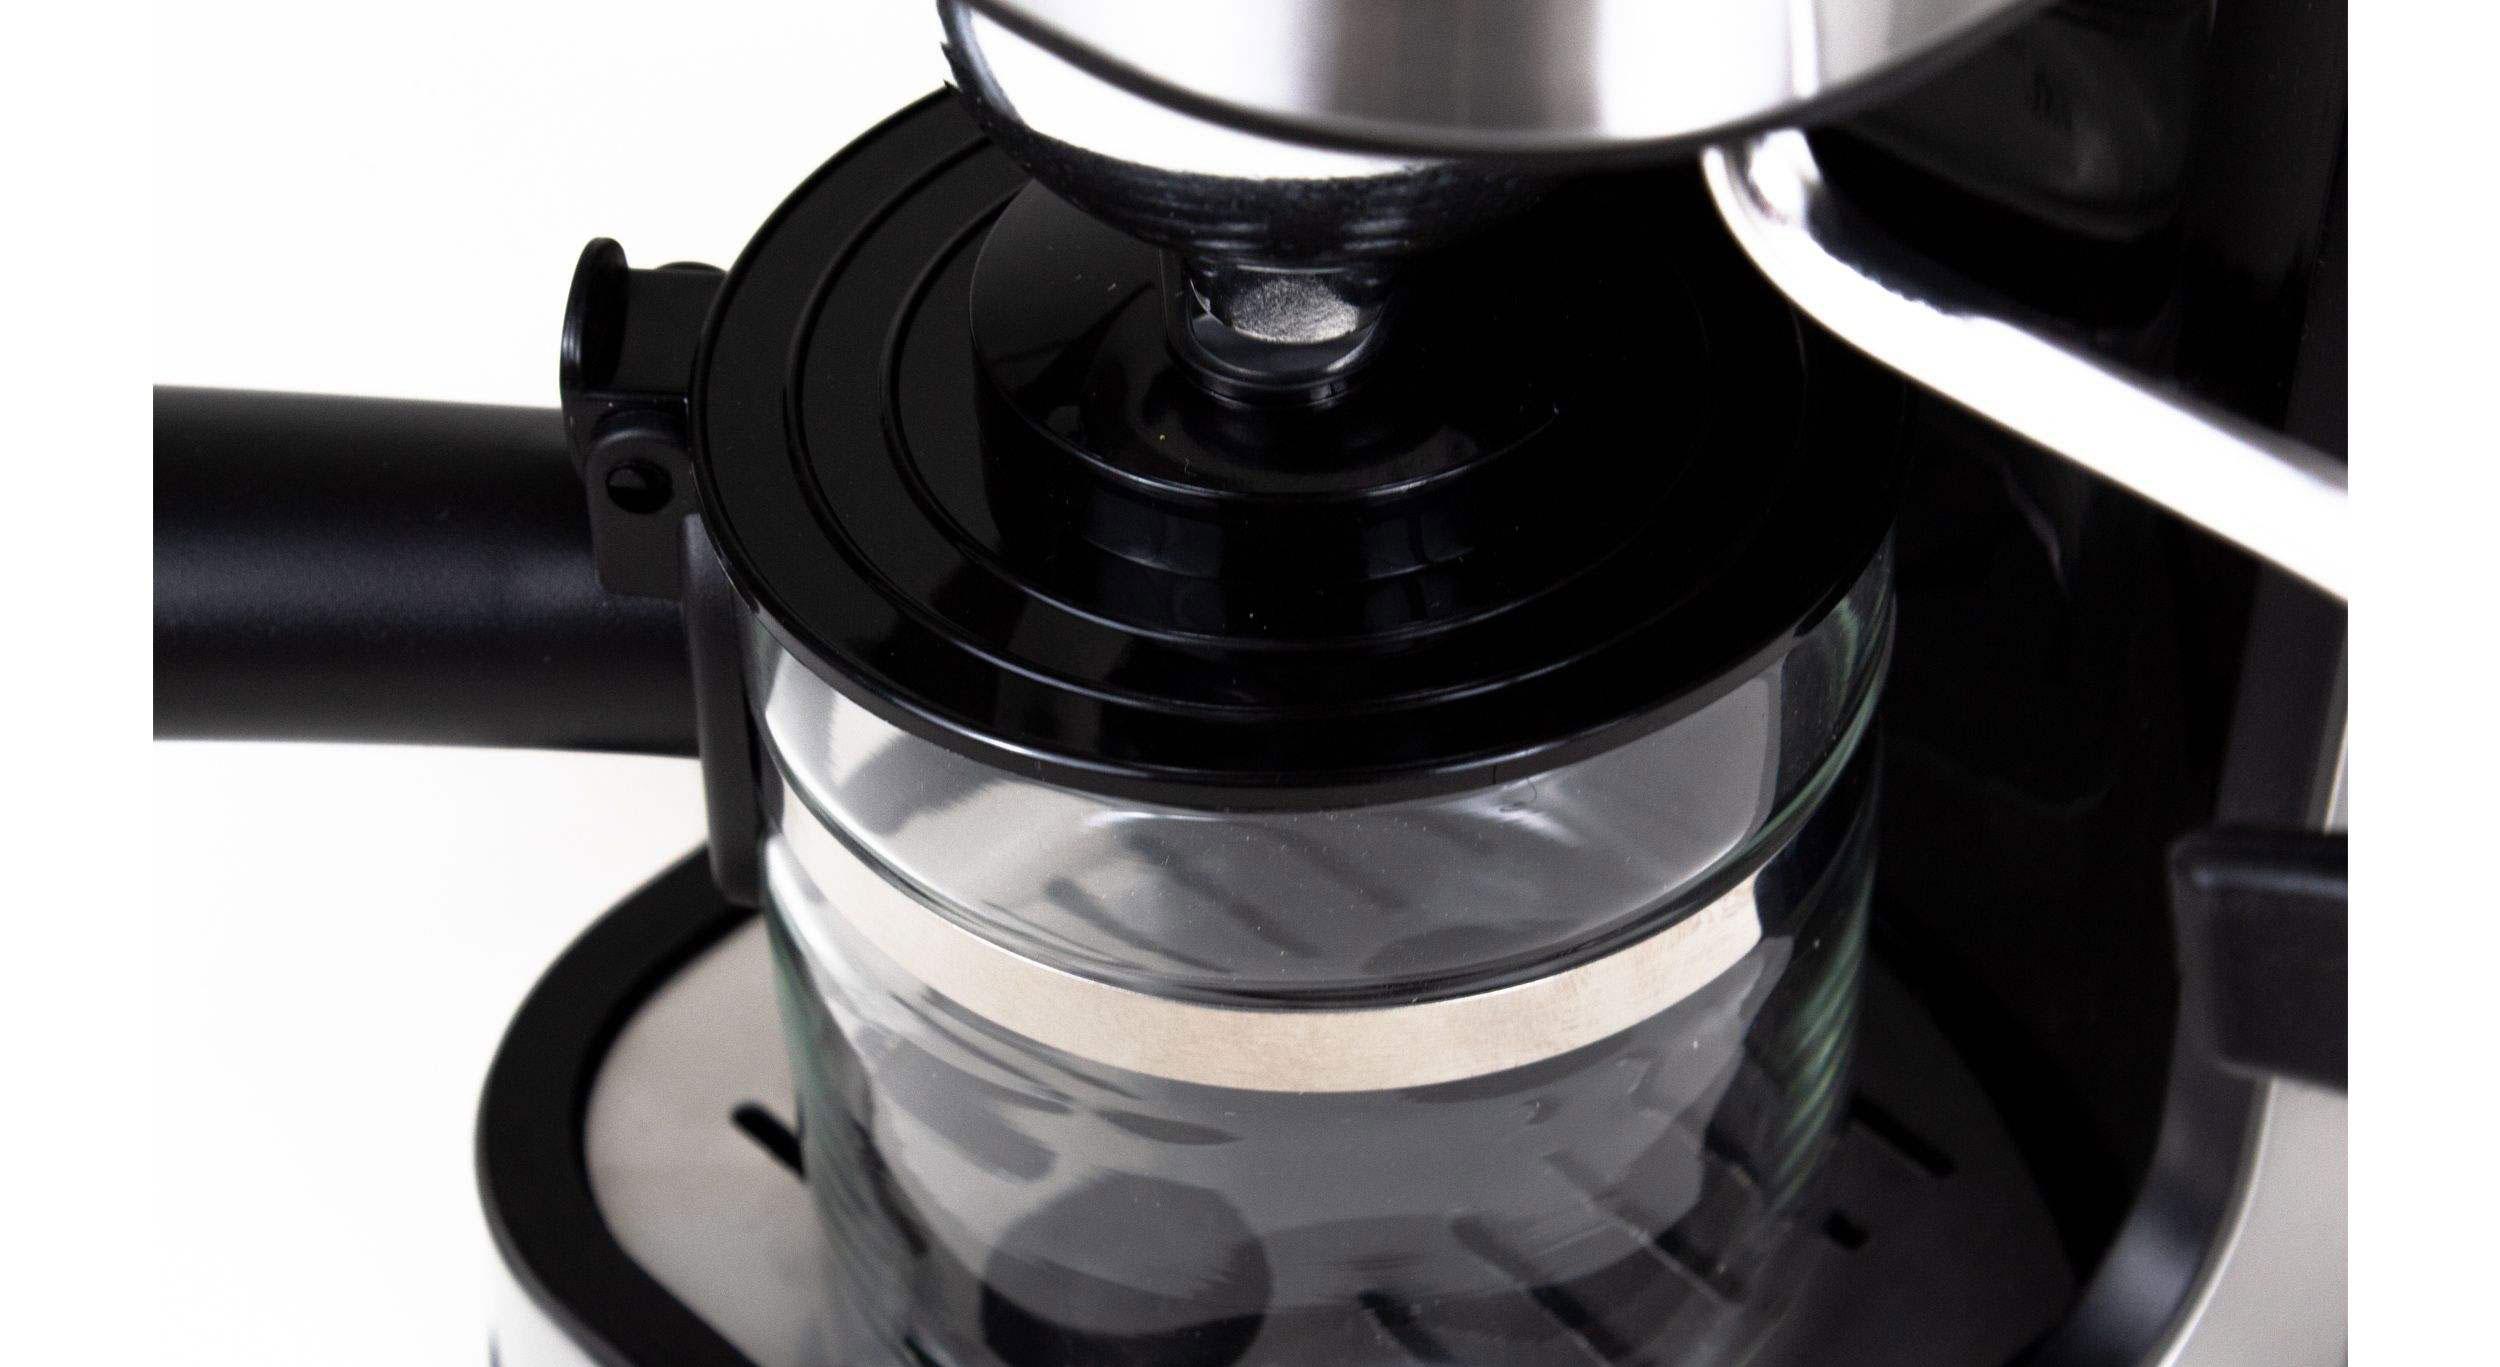 Techno Te 817 Espresso Maker dominokala 4 - اسپرسوساز تکنو TE-817